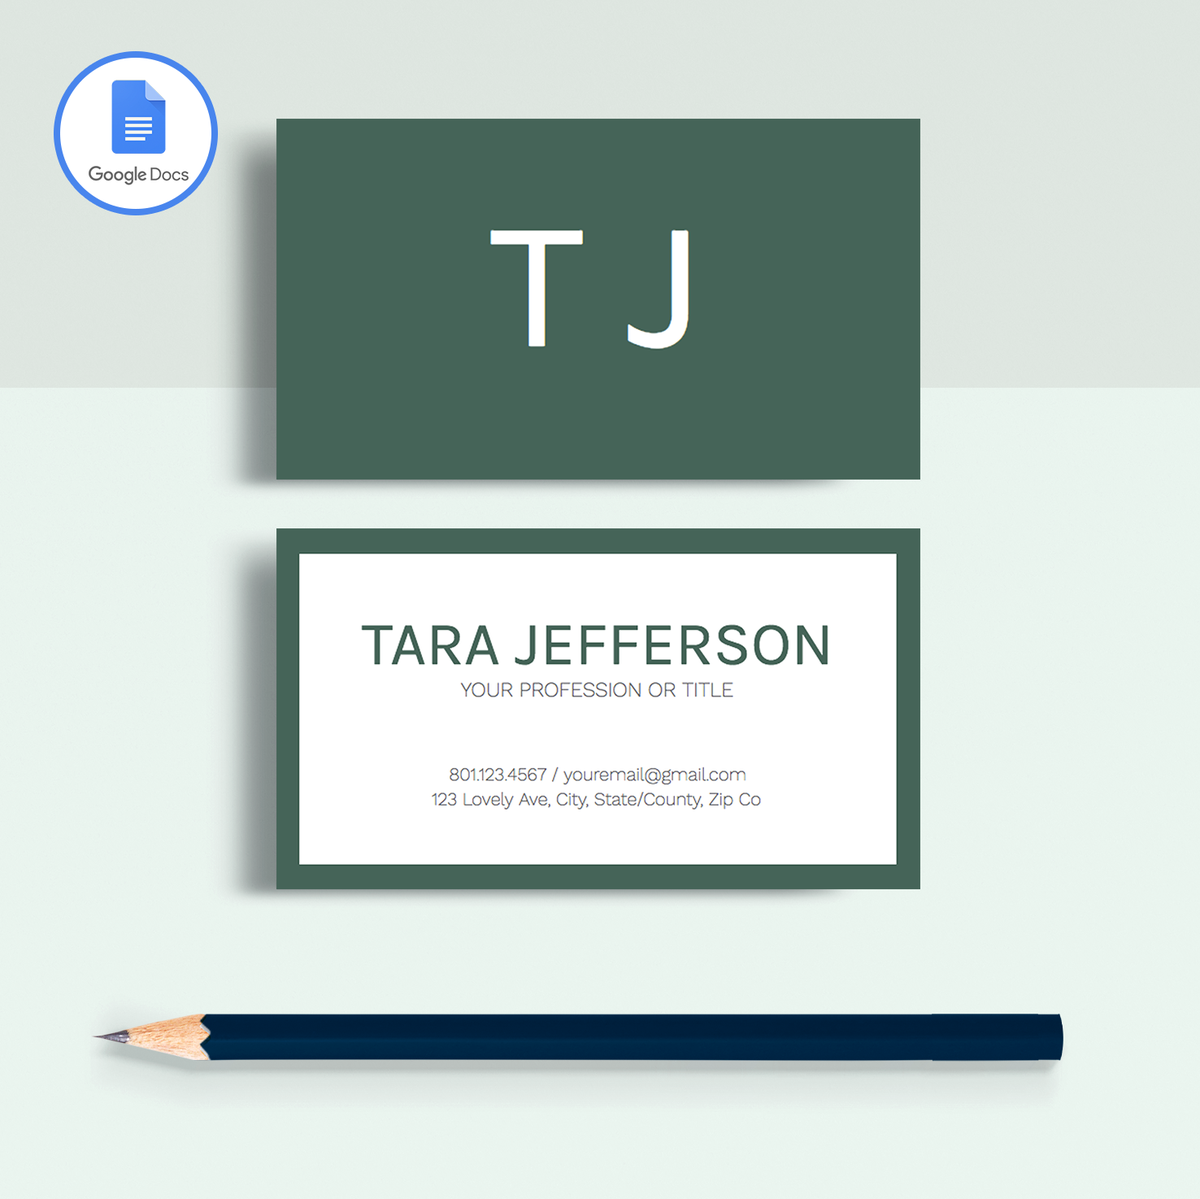 Tara Jefferson Google Docs Professional Business Cards Template